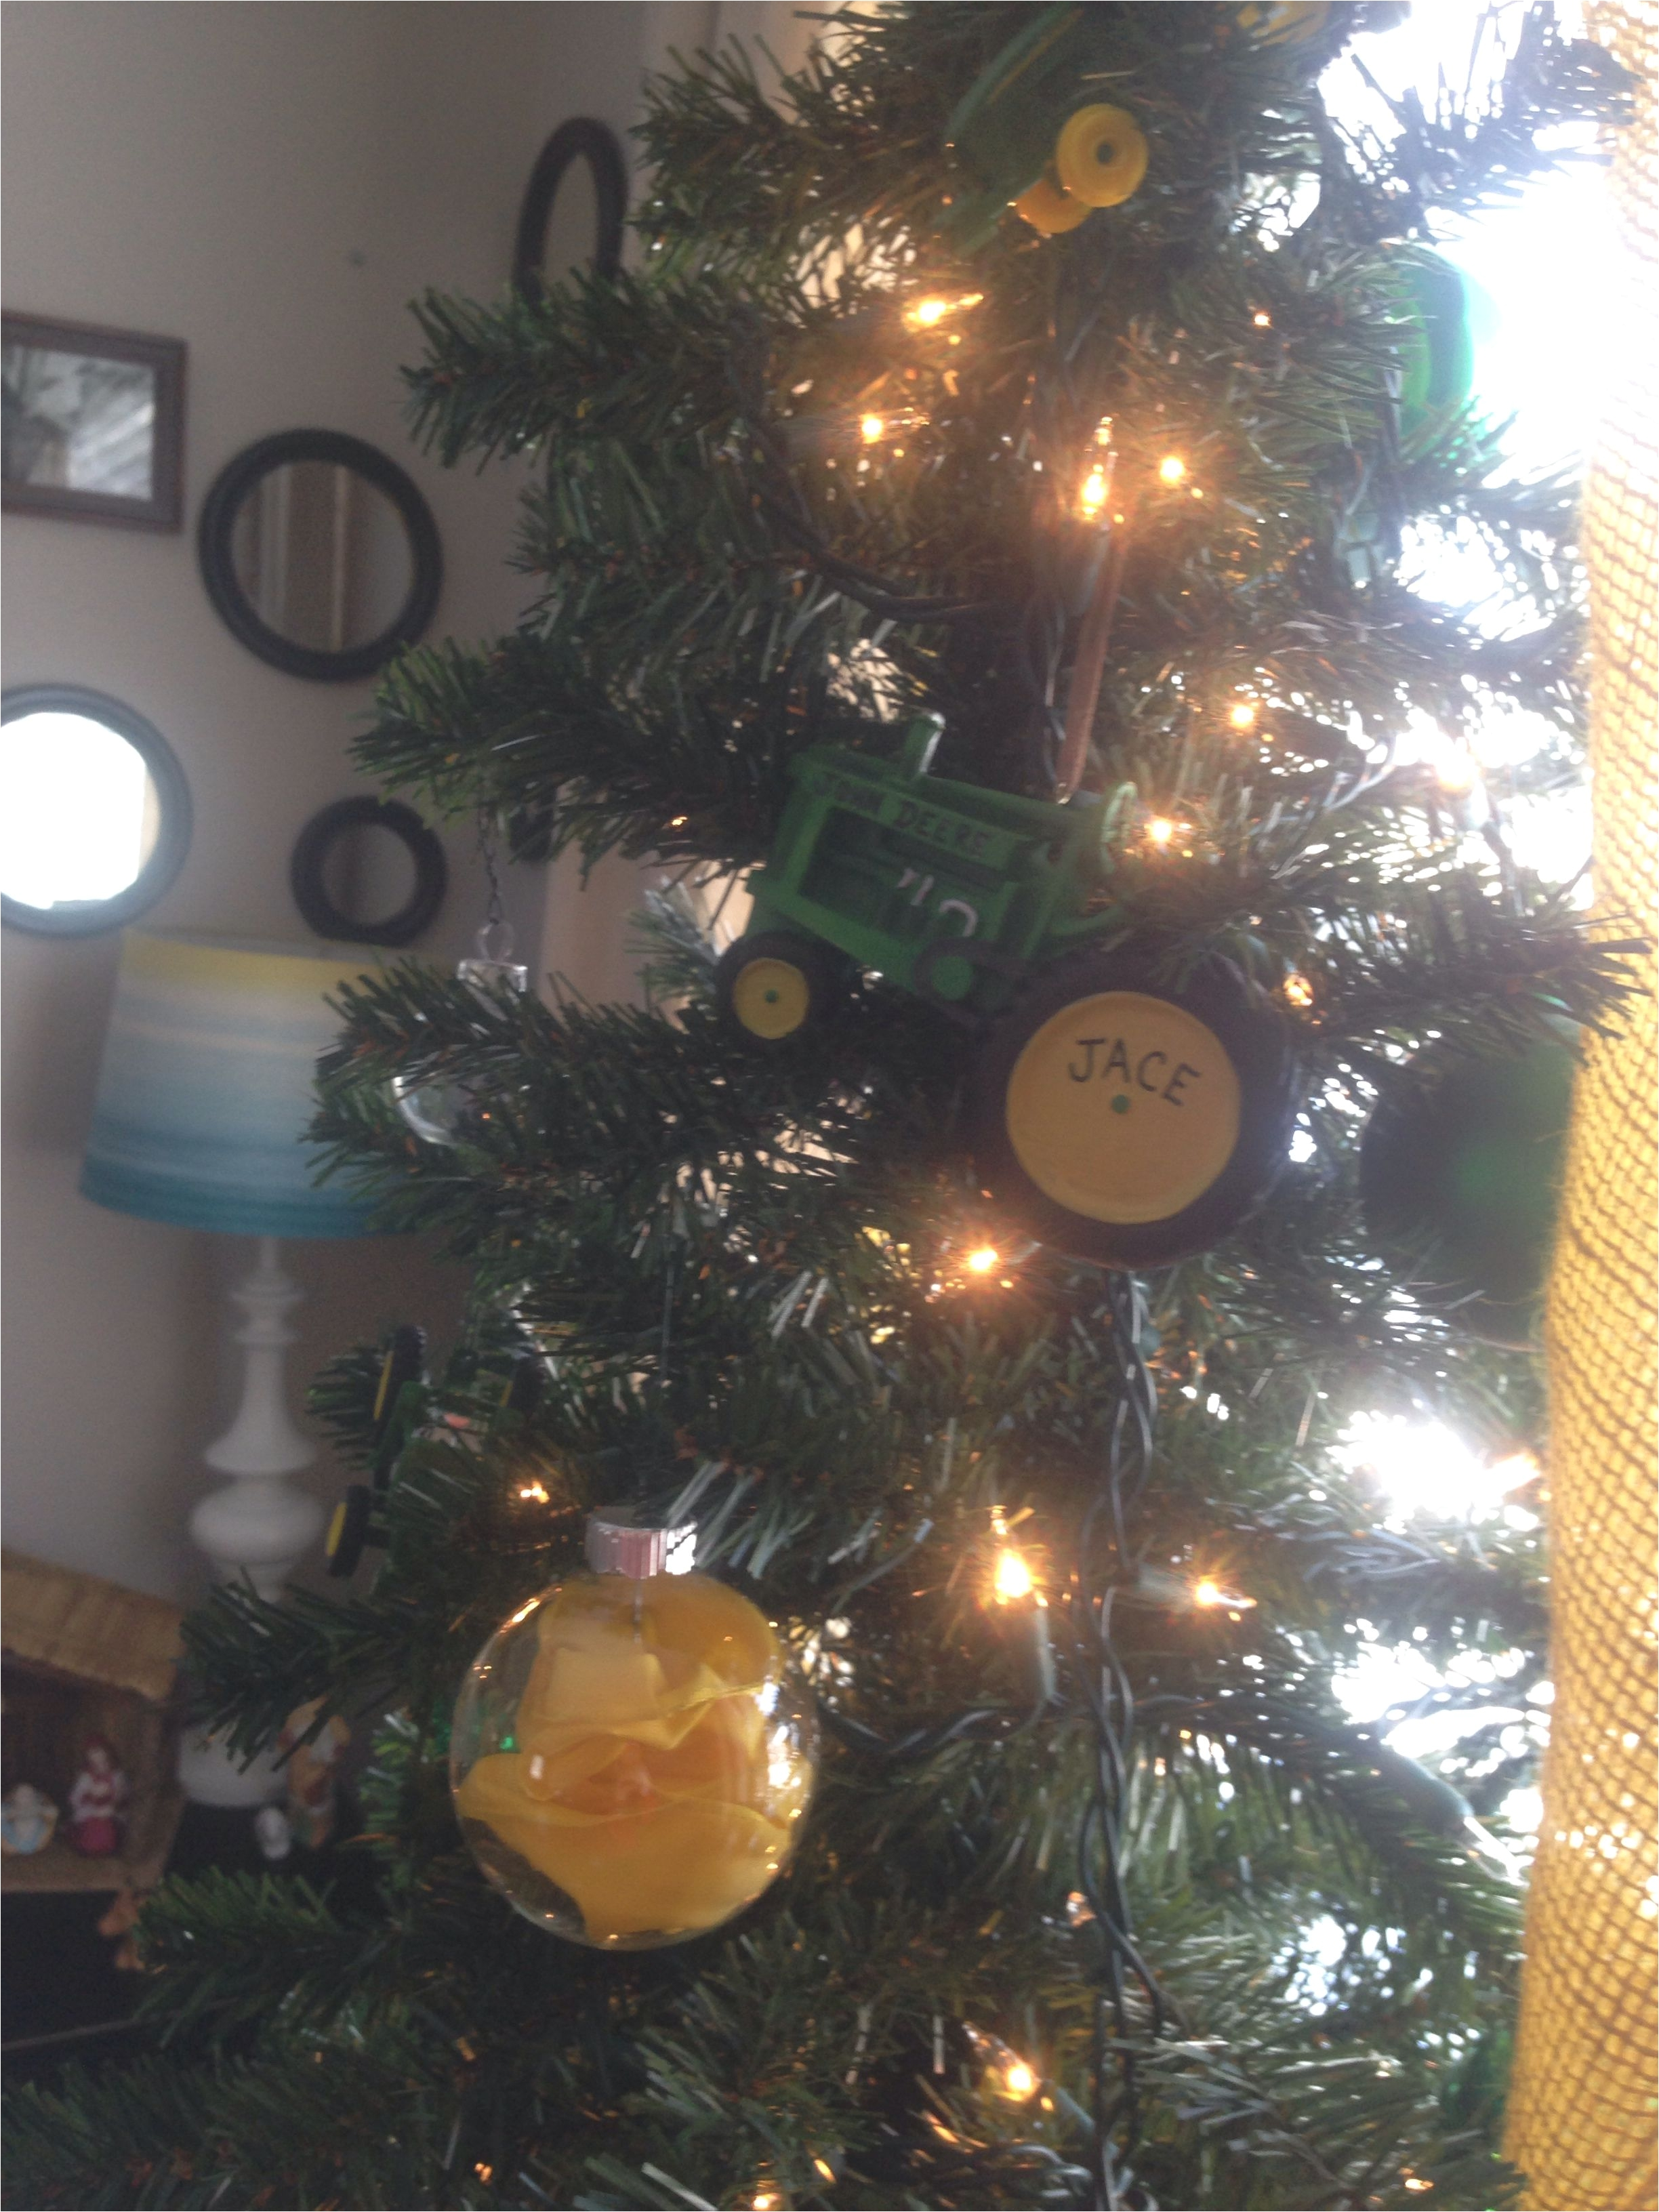 enchanting john deere home decor at john deere christmas tree home decorating pinterest